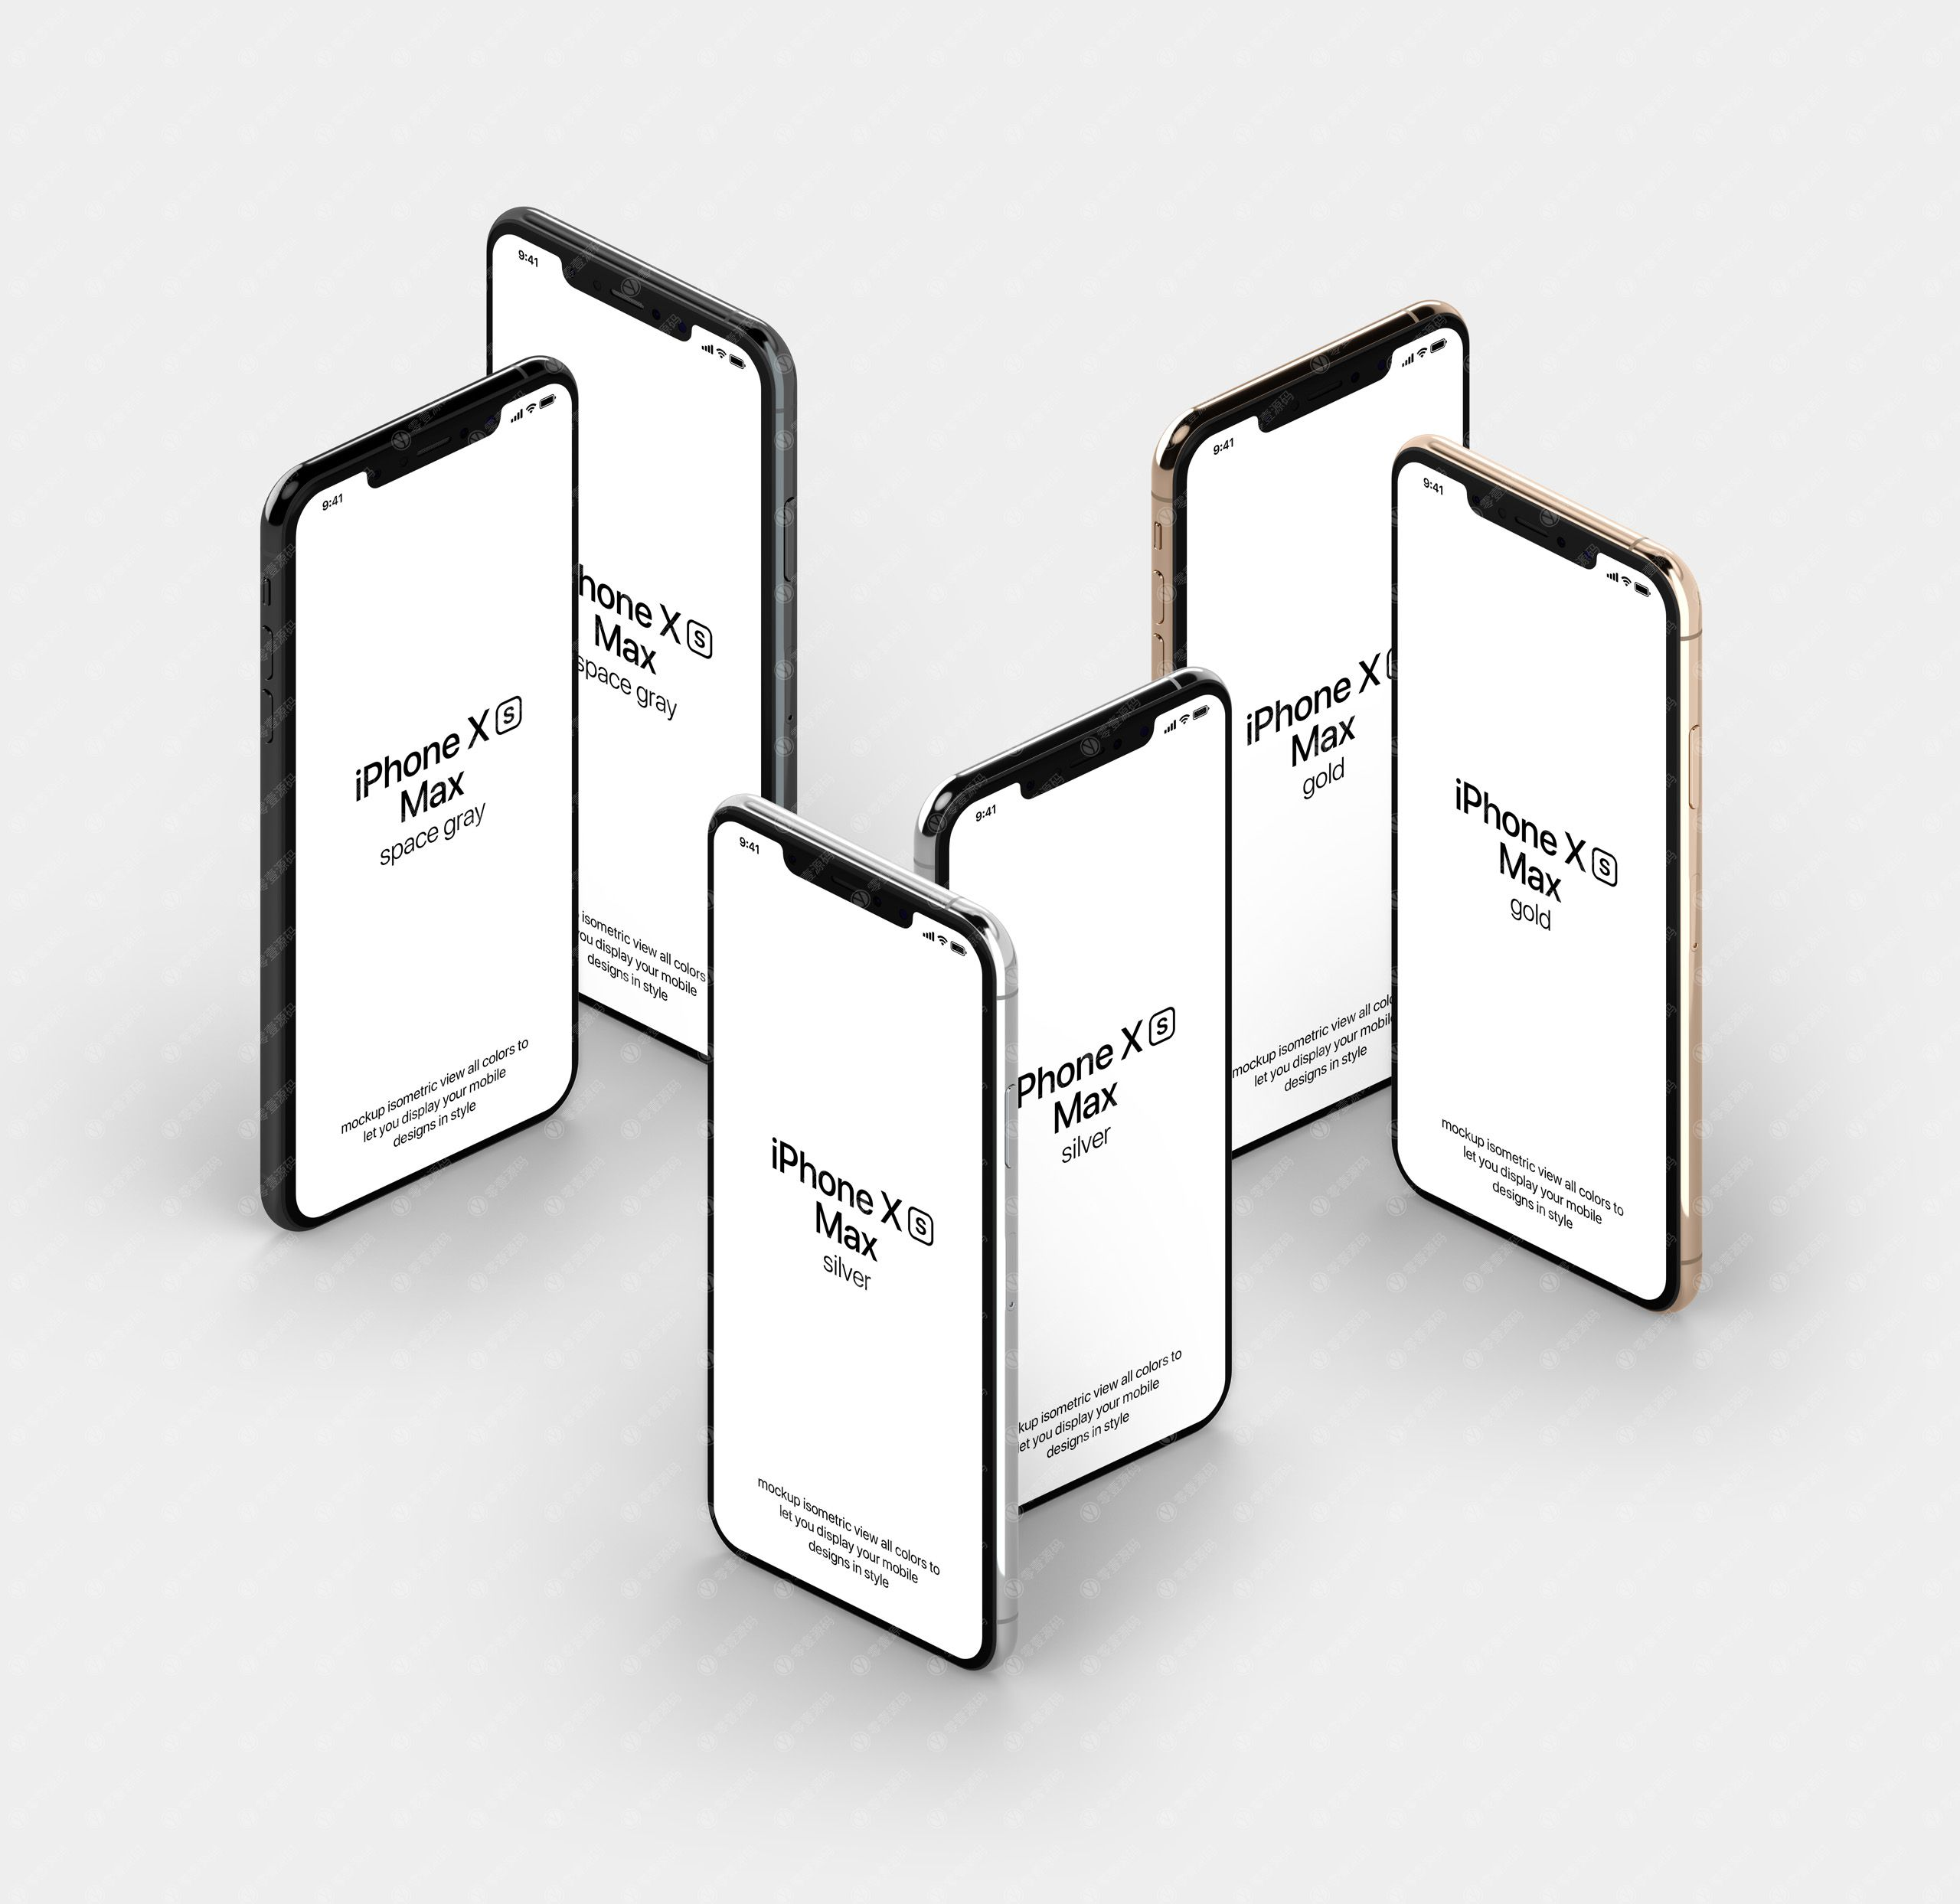 iPhoneXS Max苹果XS手机样机组合展示模型素材psd源文件